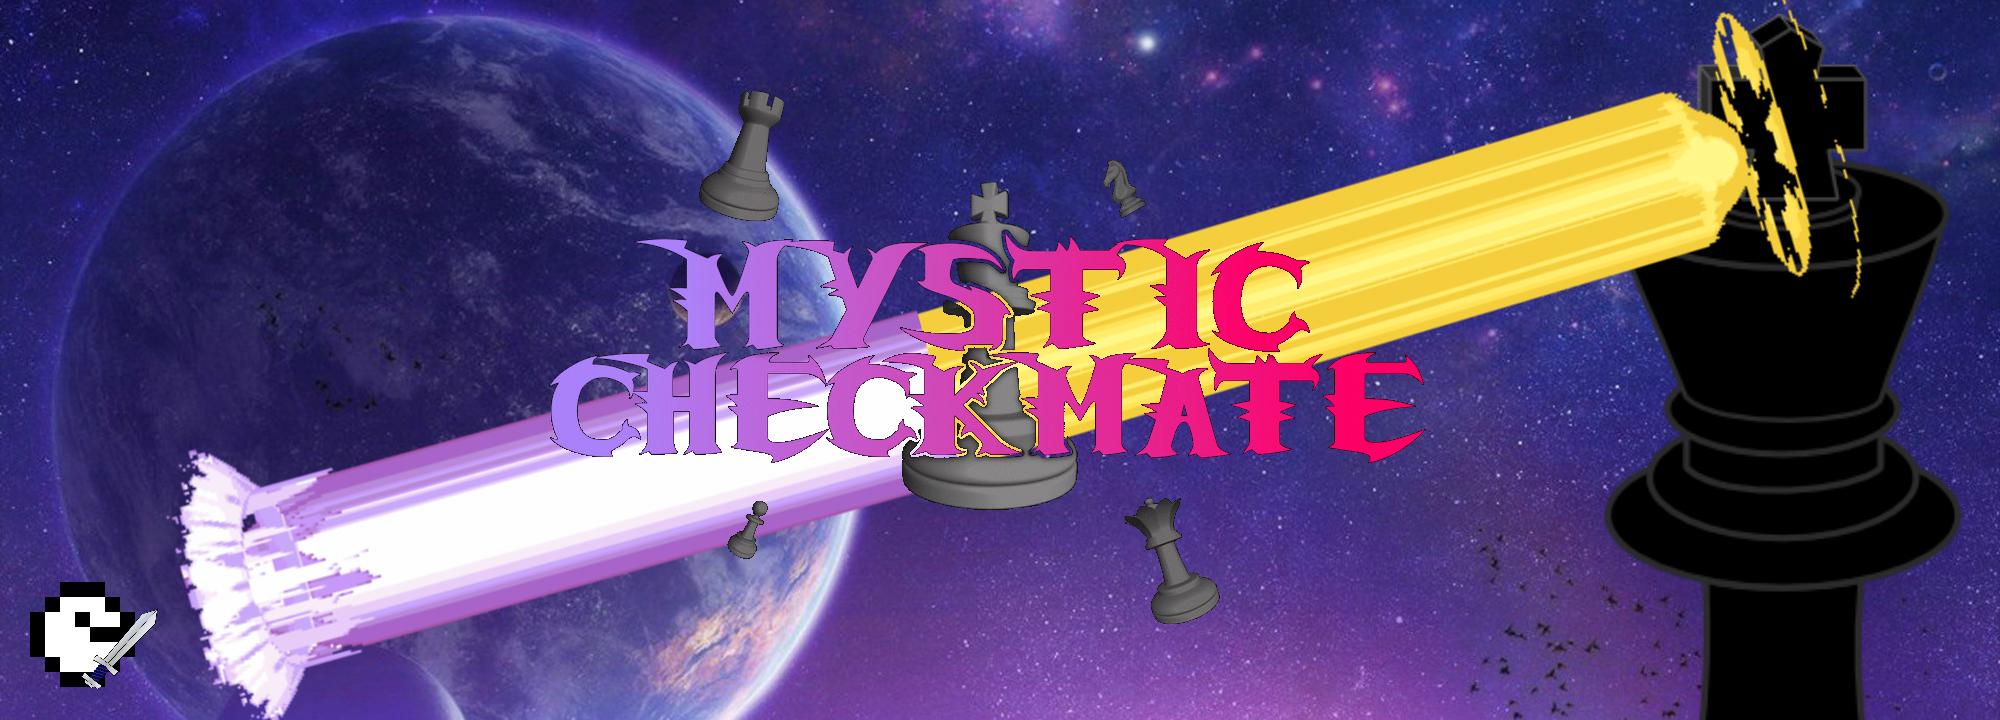 Mystic Checkmate